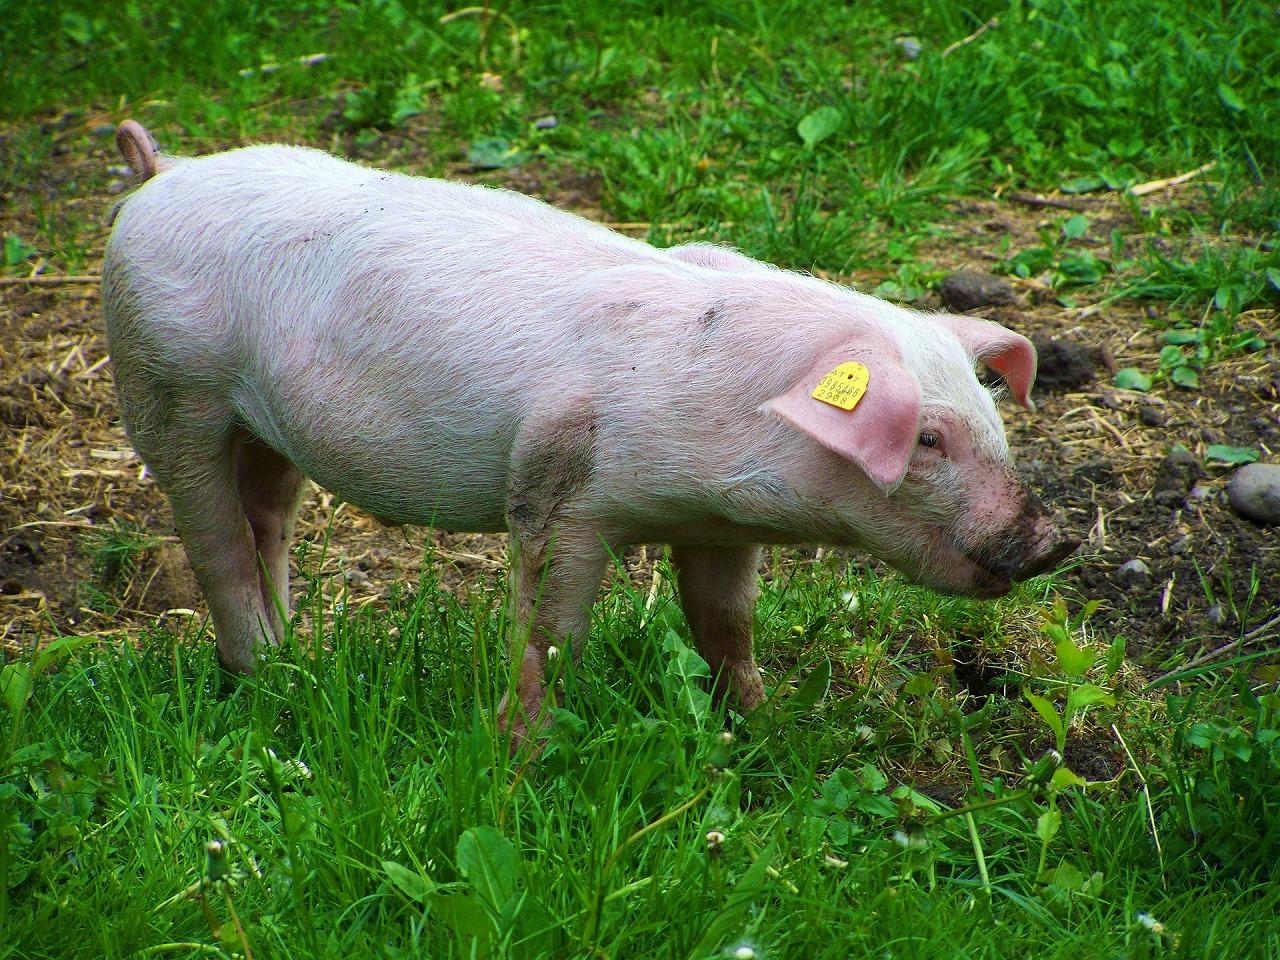 little-piglets-767476_1920